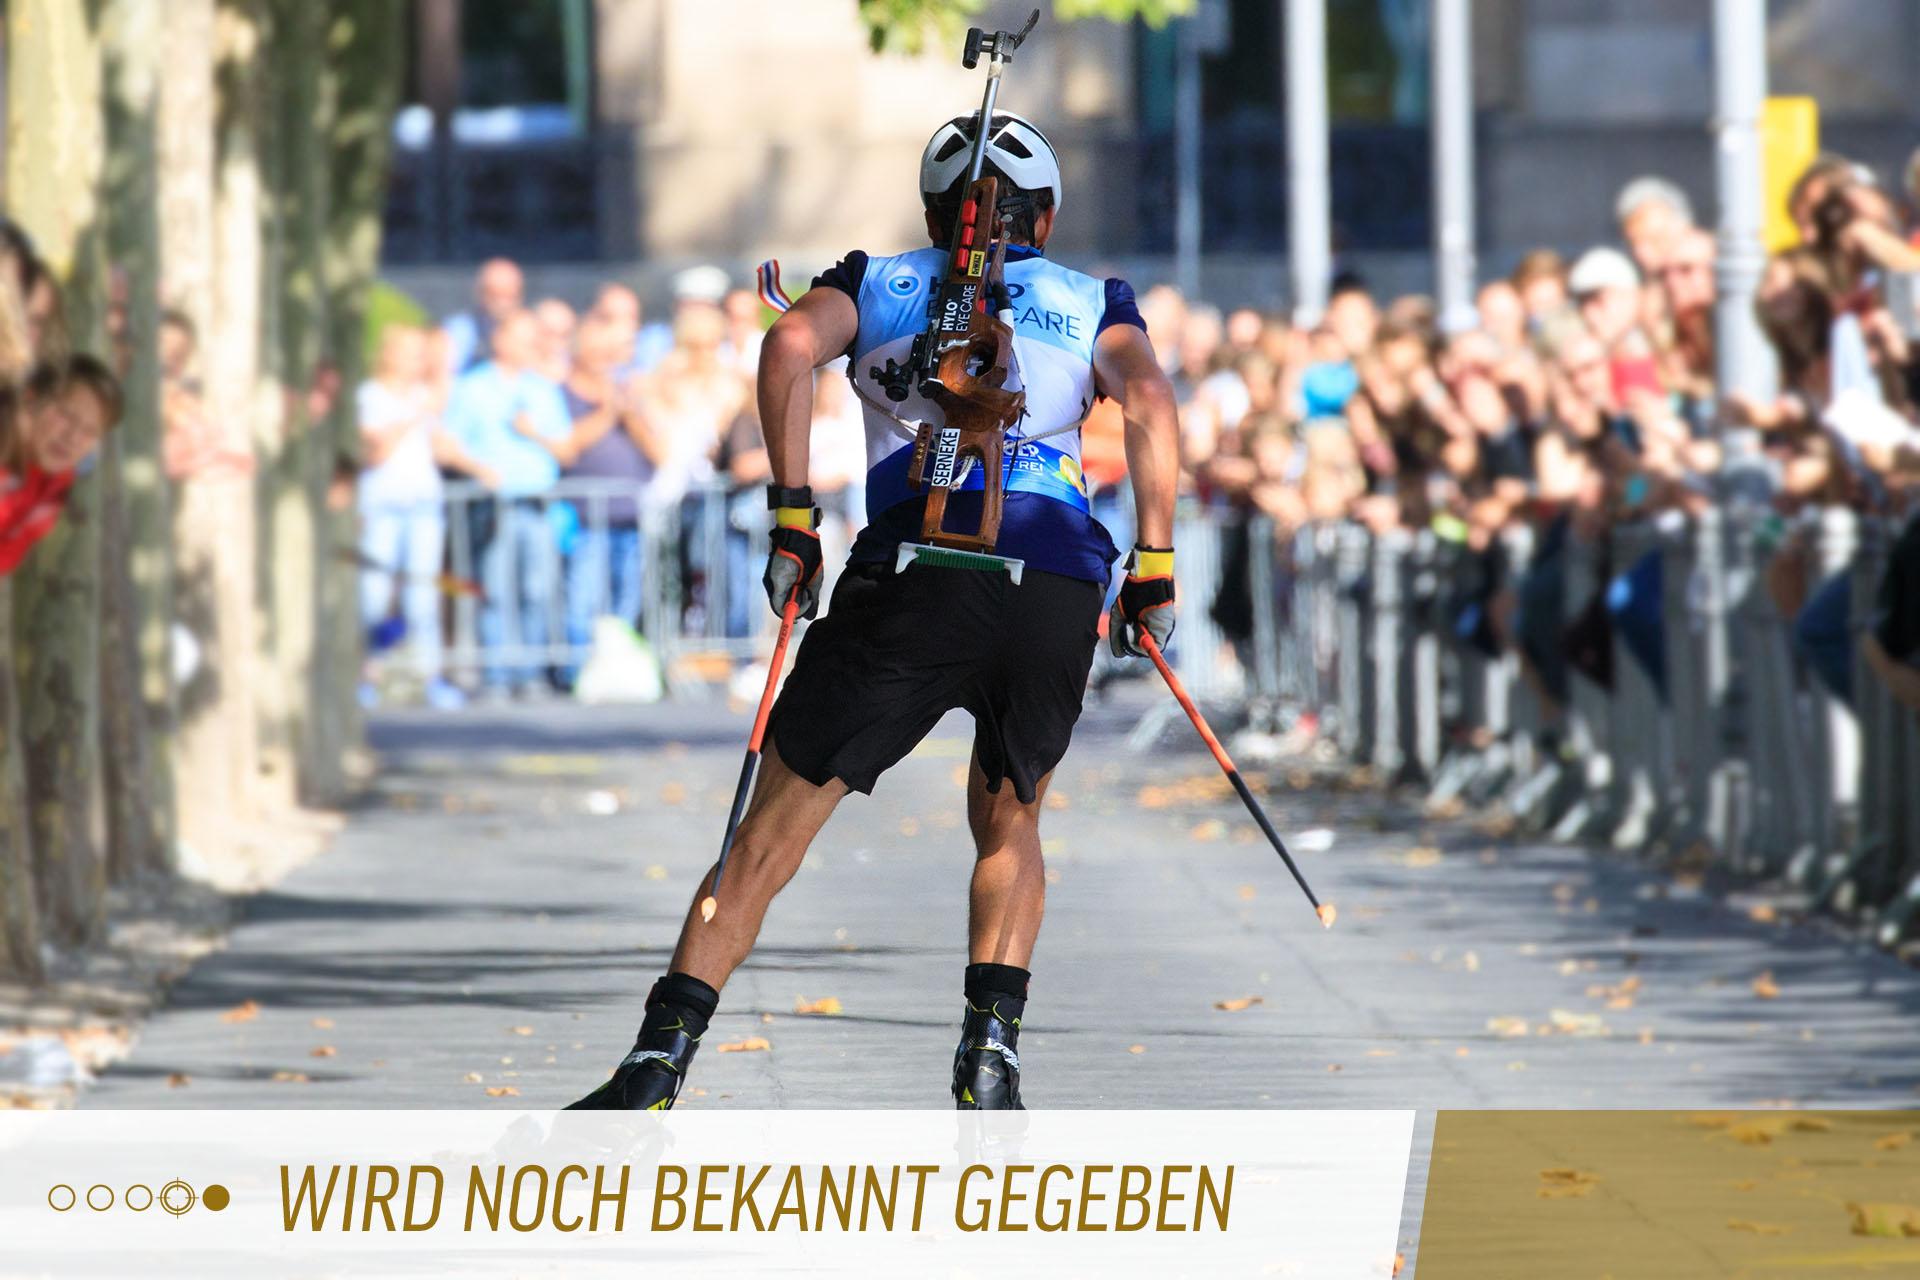 Athleten_HerrenUnbekannt